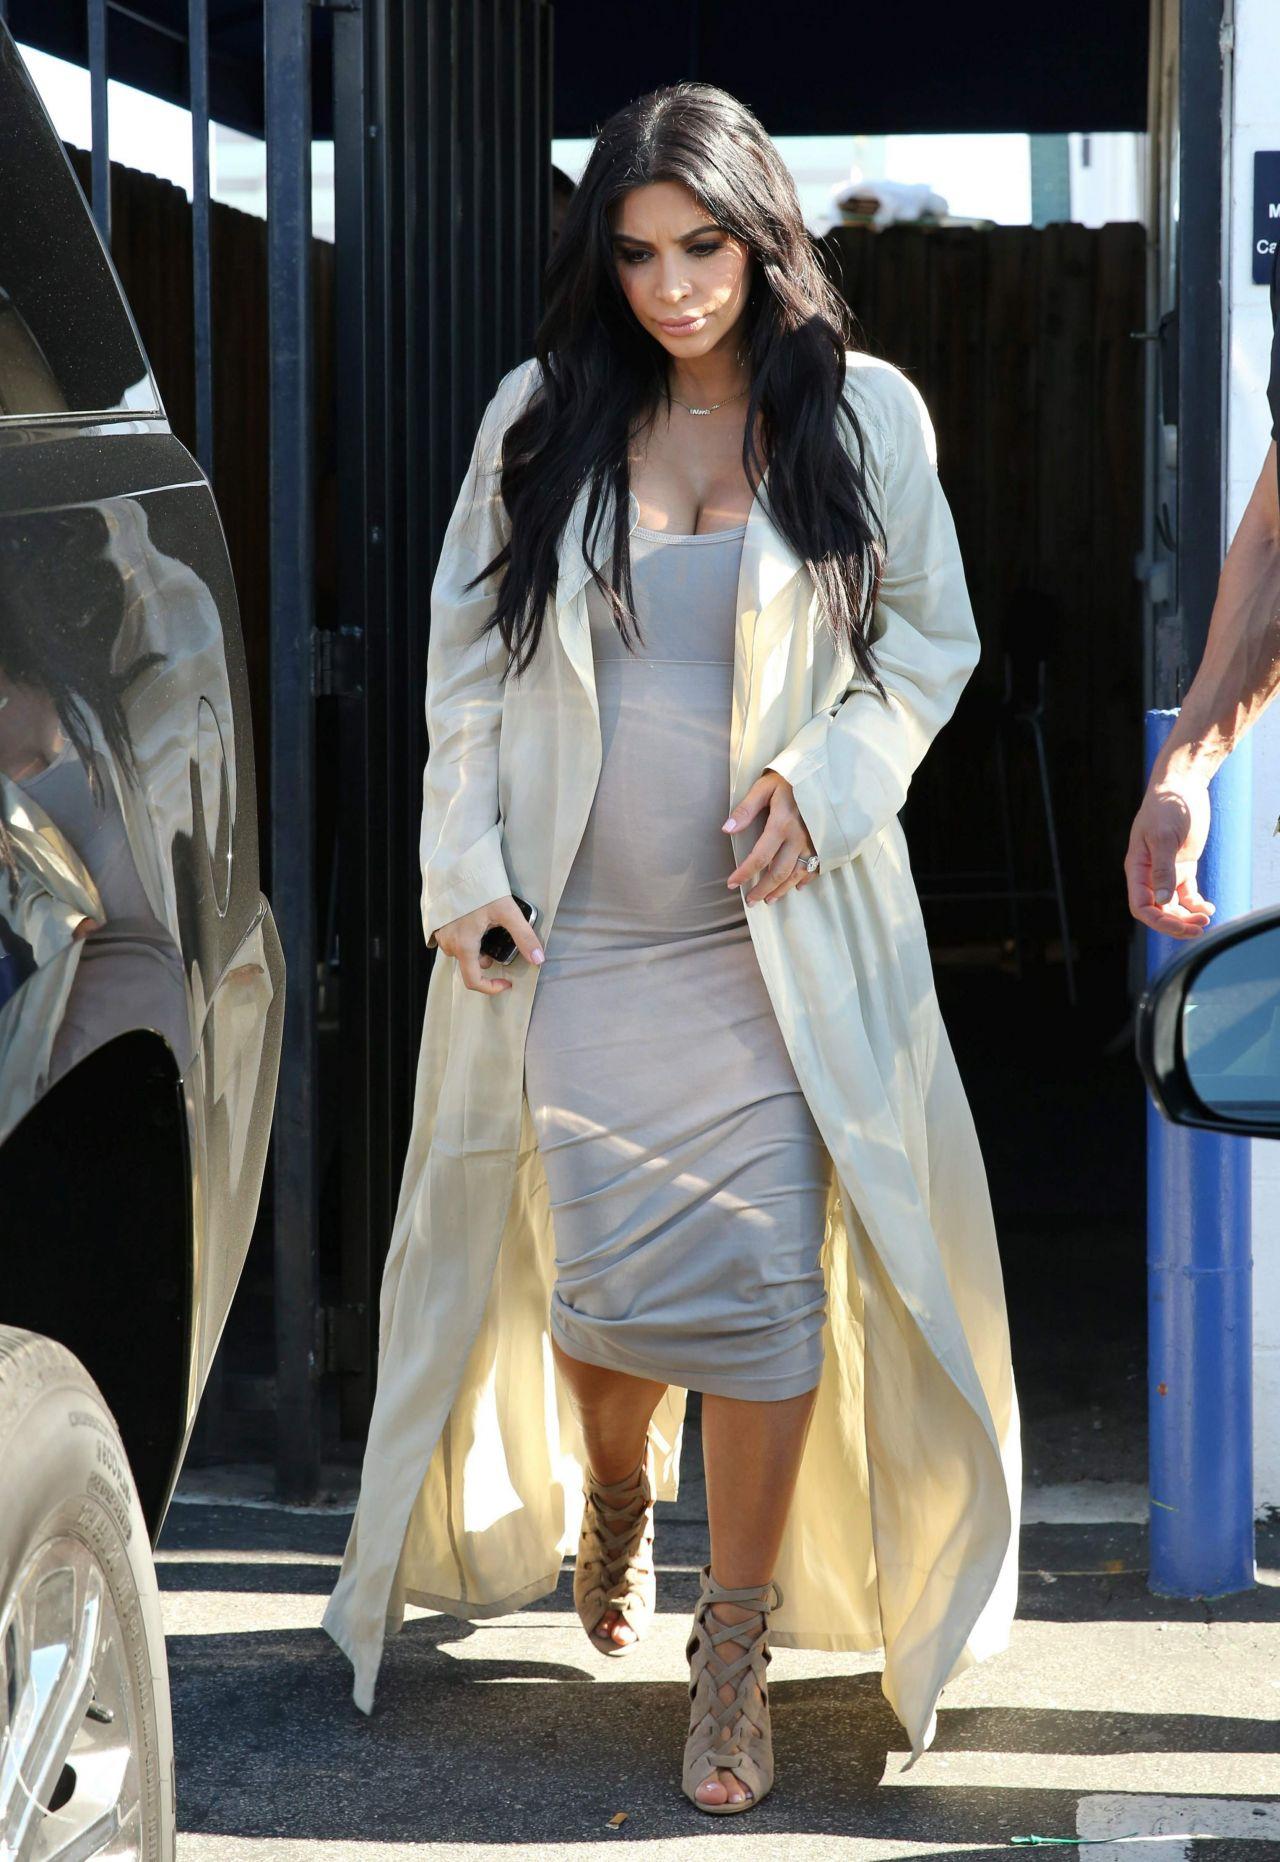 kim-kardashian-street-fashion-at-a-studio-in-los-angeles-july-2015_1